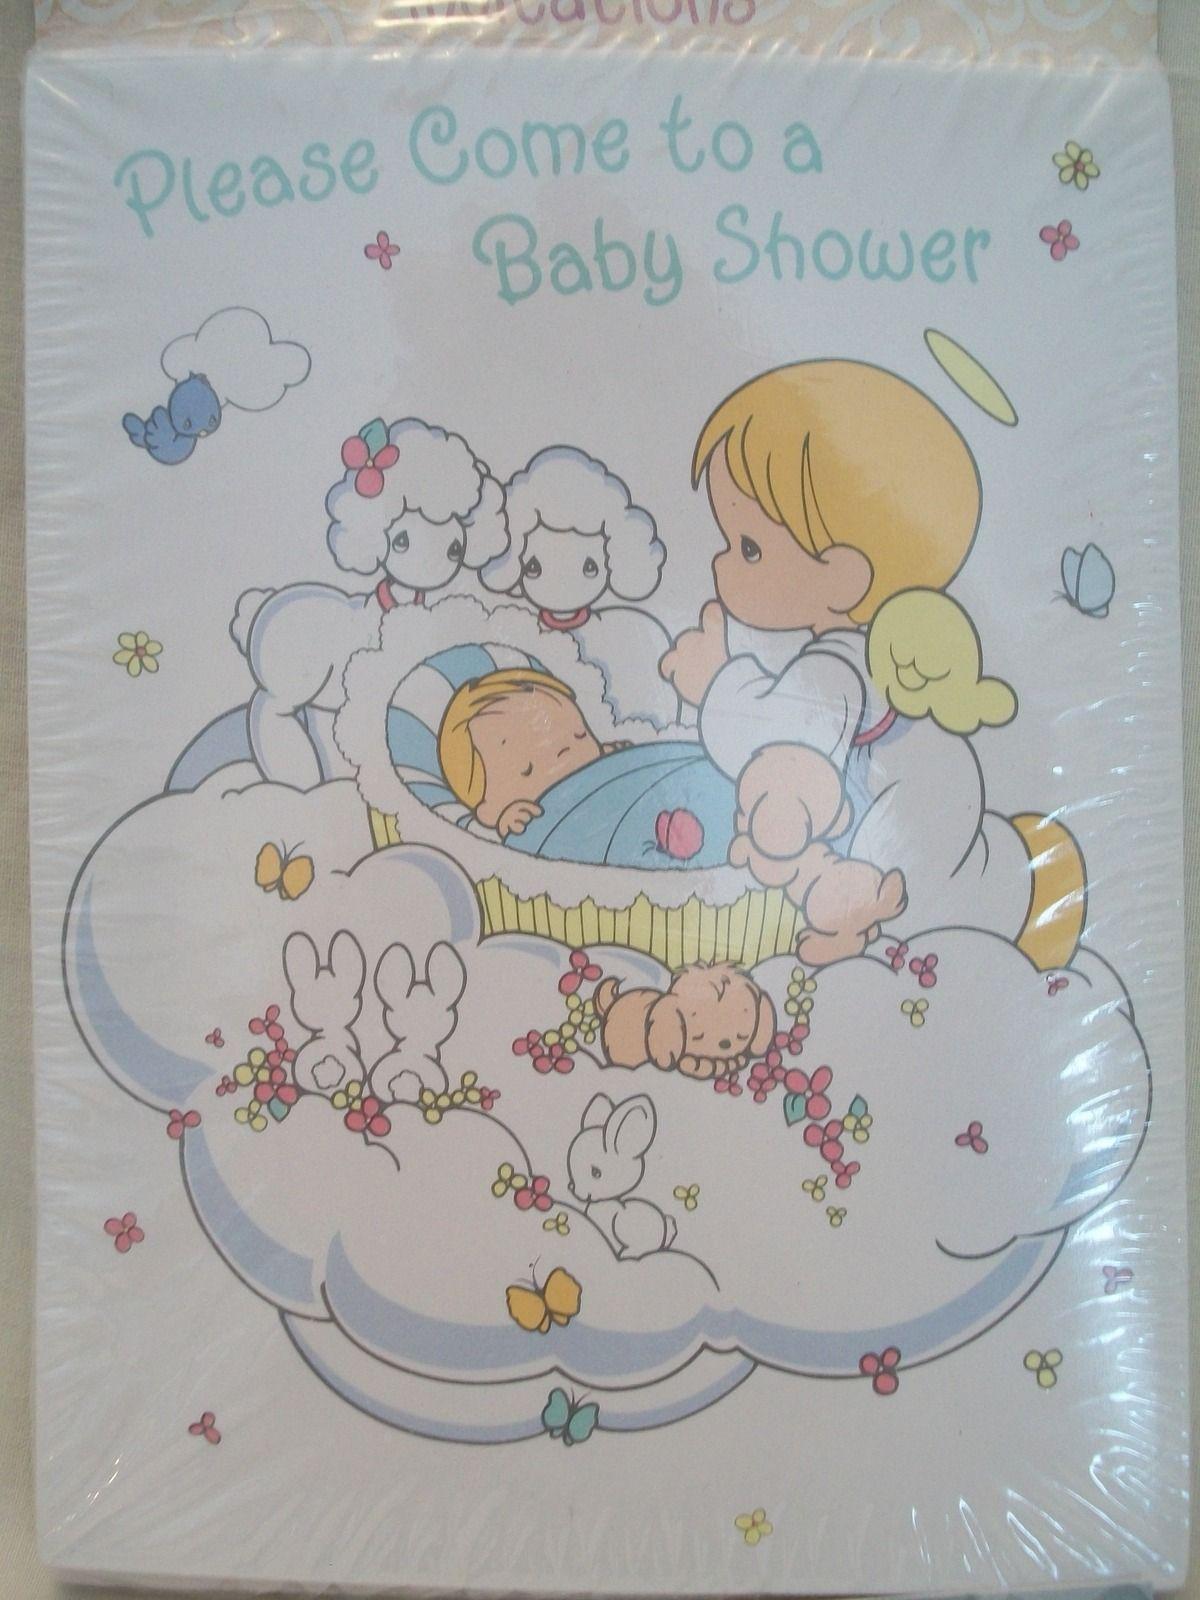 Precious Moments Baby Shower invitations